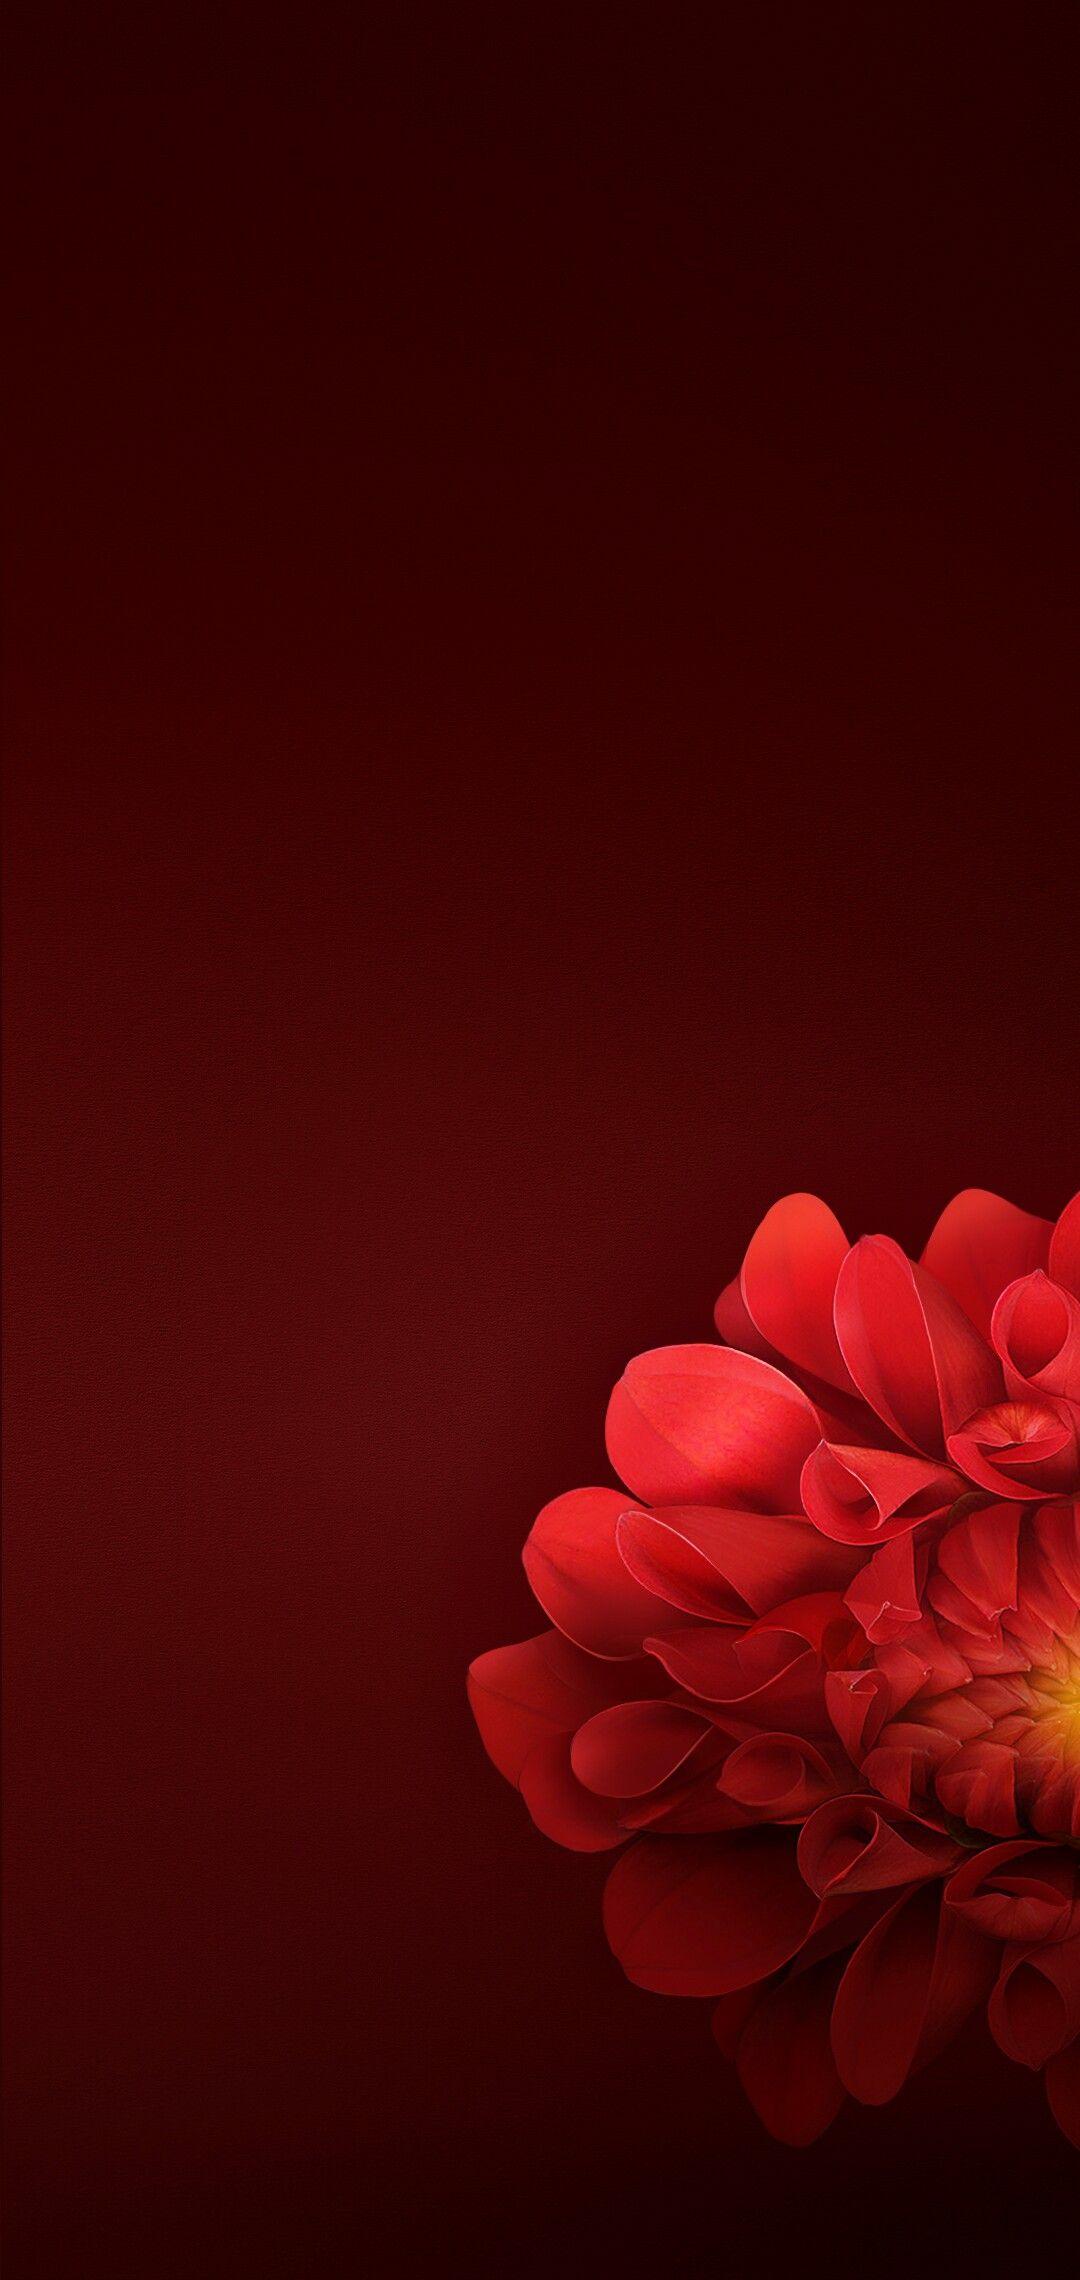 Pin On Flowers Flower wallpaper hd mobile